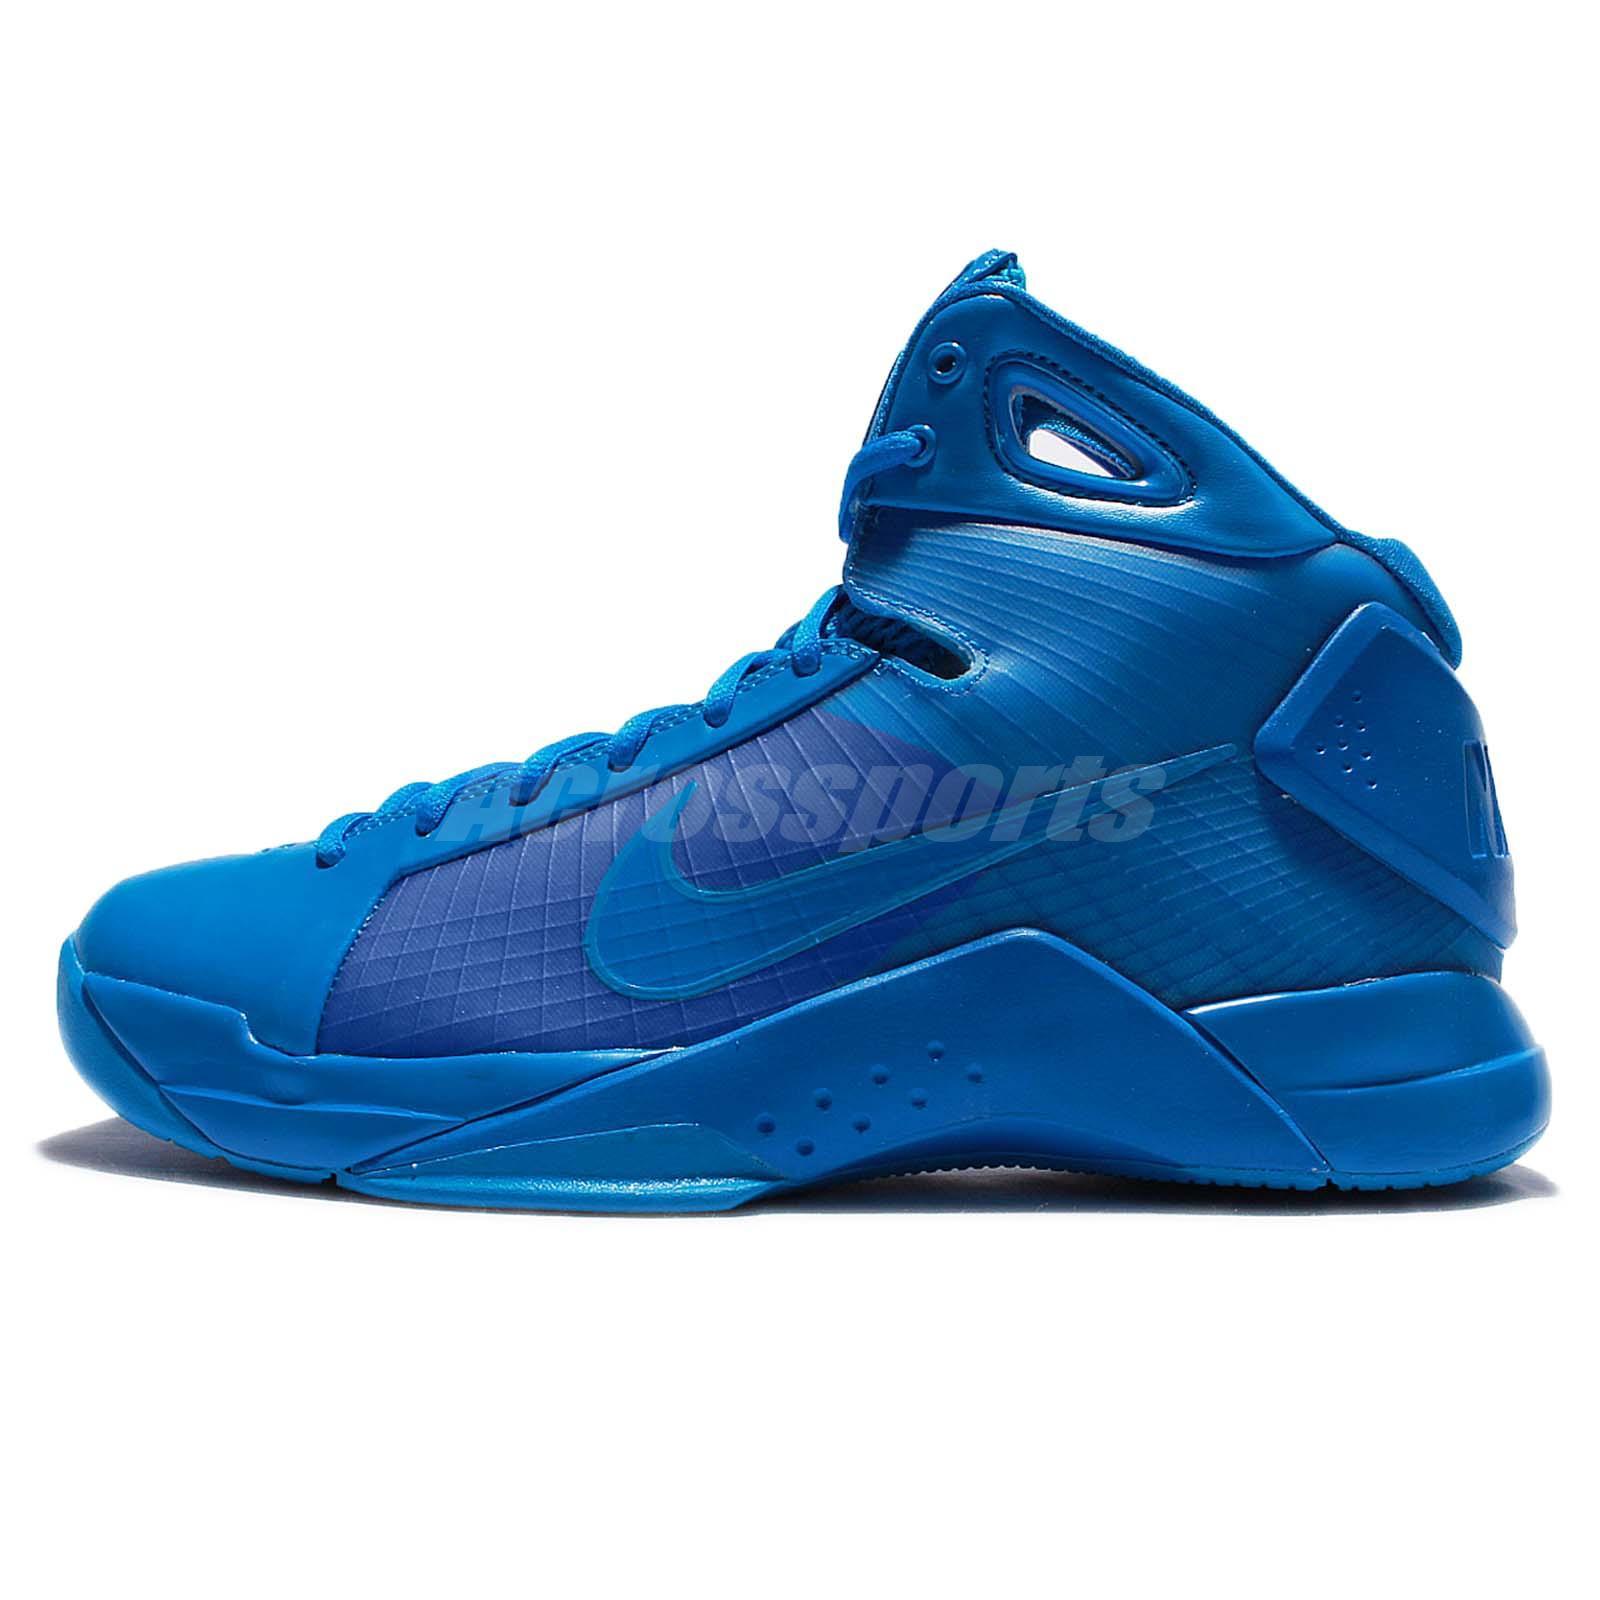 ... Nike Hyperdunk 08 Kobe Bryant FTB Beijing Olympics Blue .